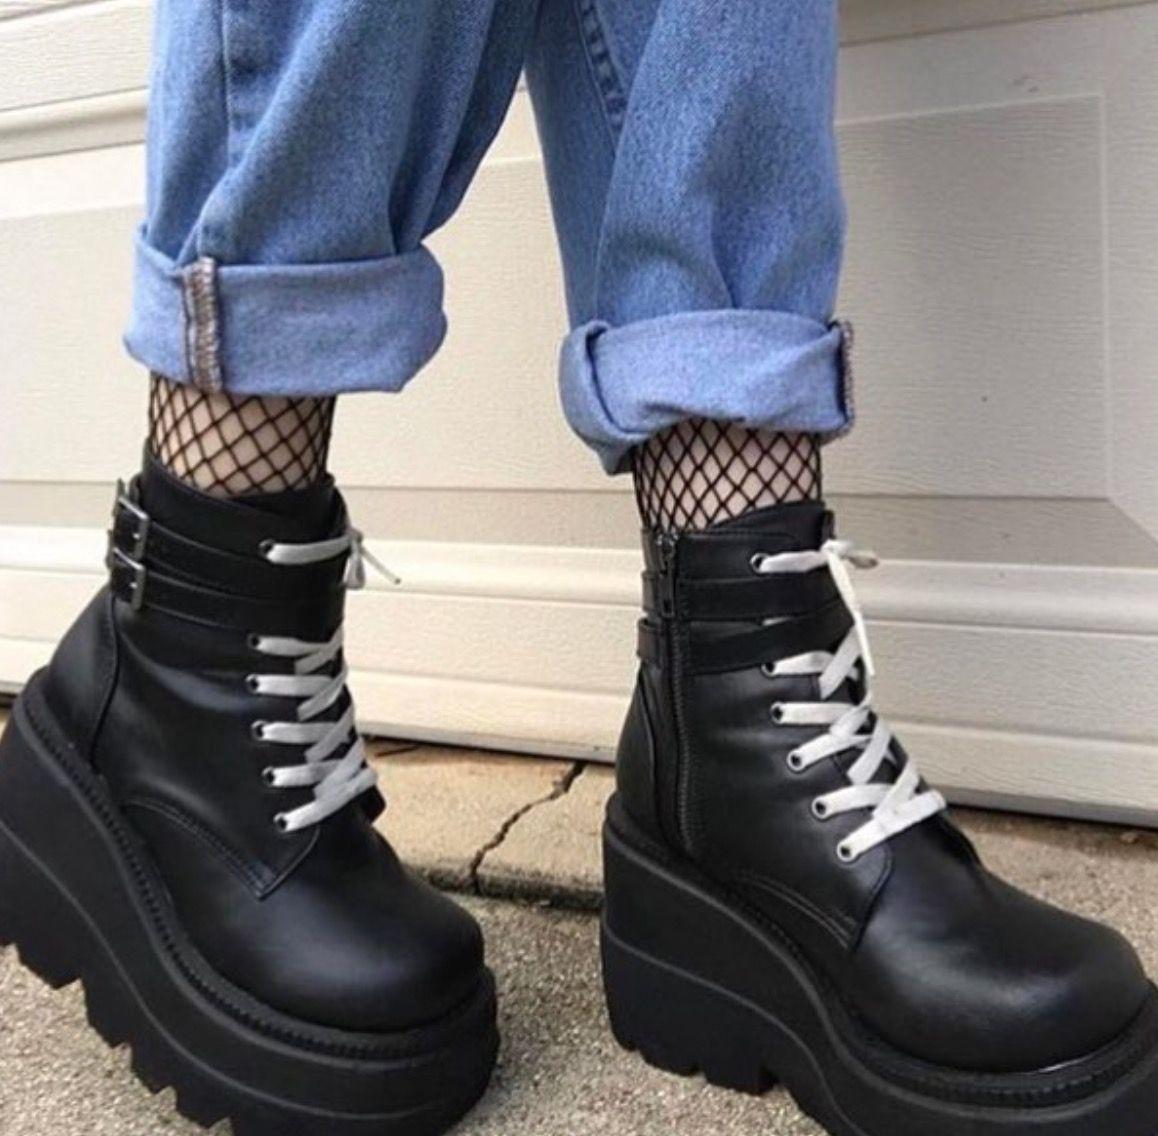 on your feet // footwear // shoes // socks // aesthetic /